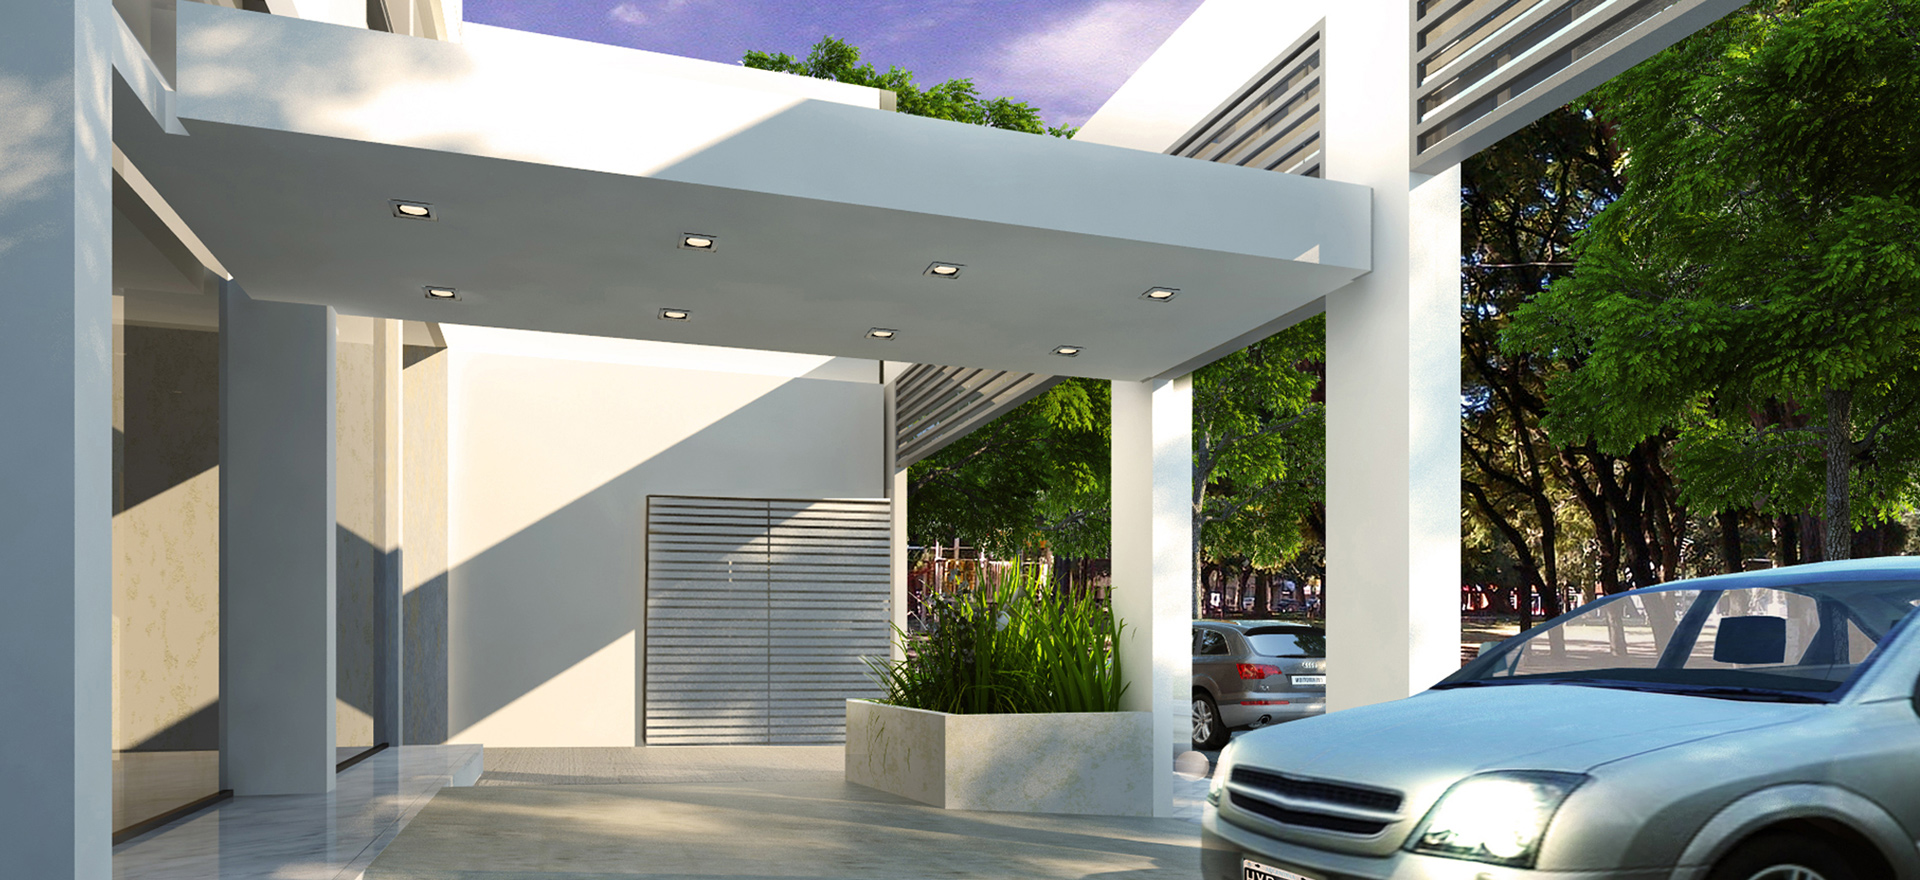 SL - Italia Plaza